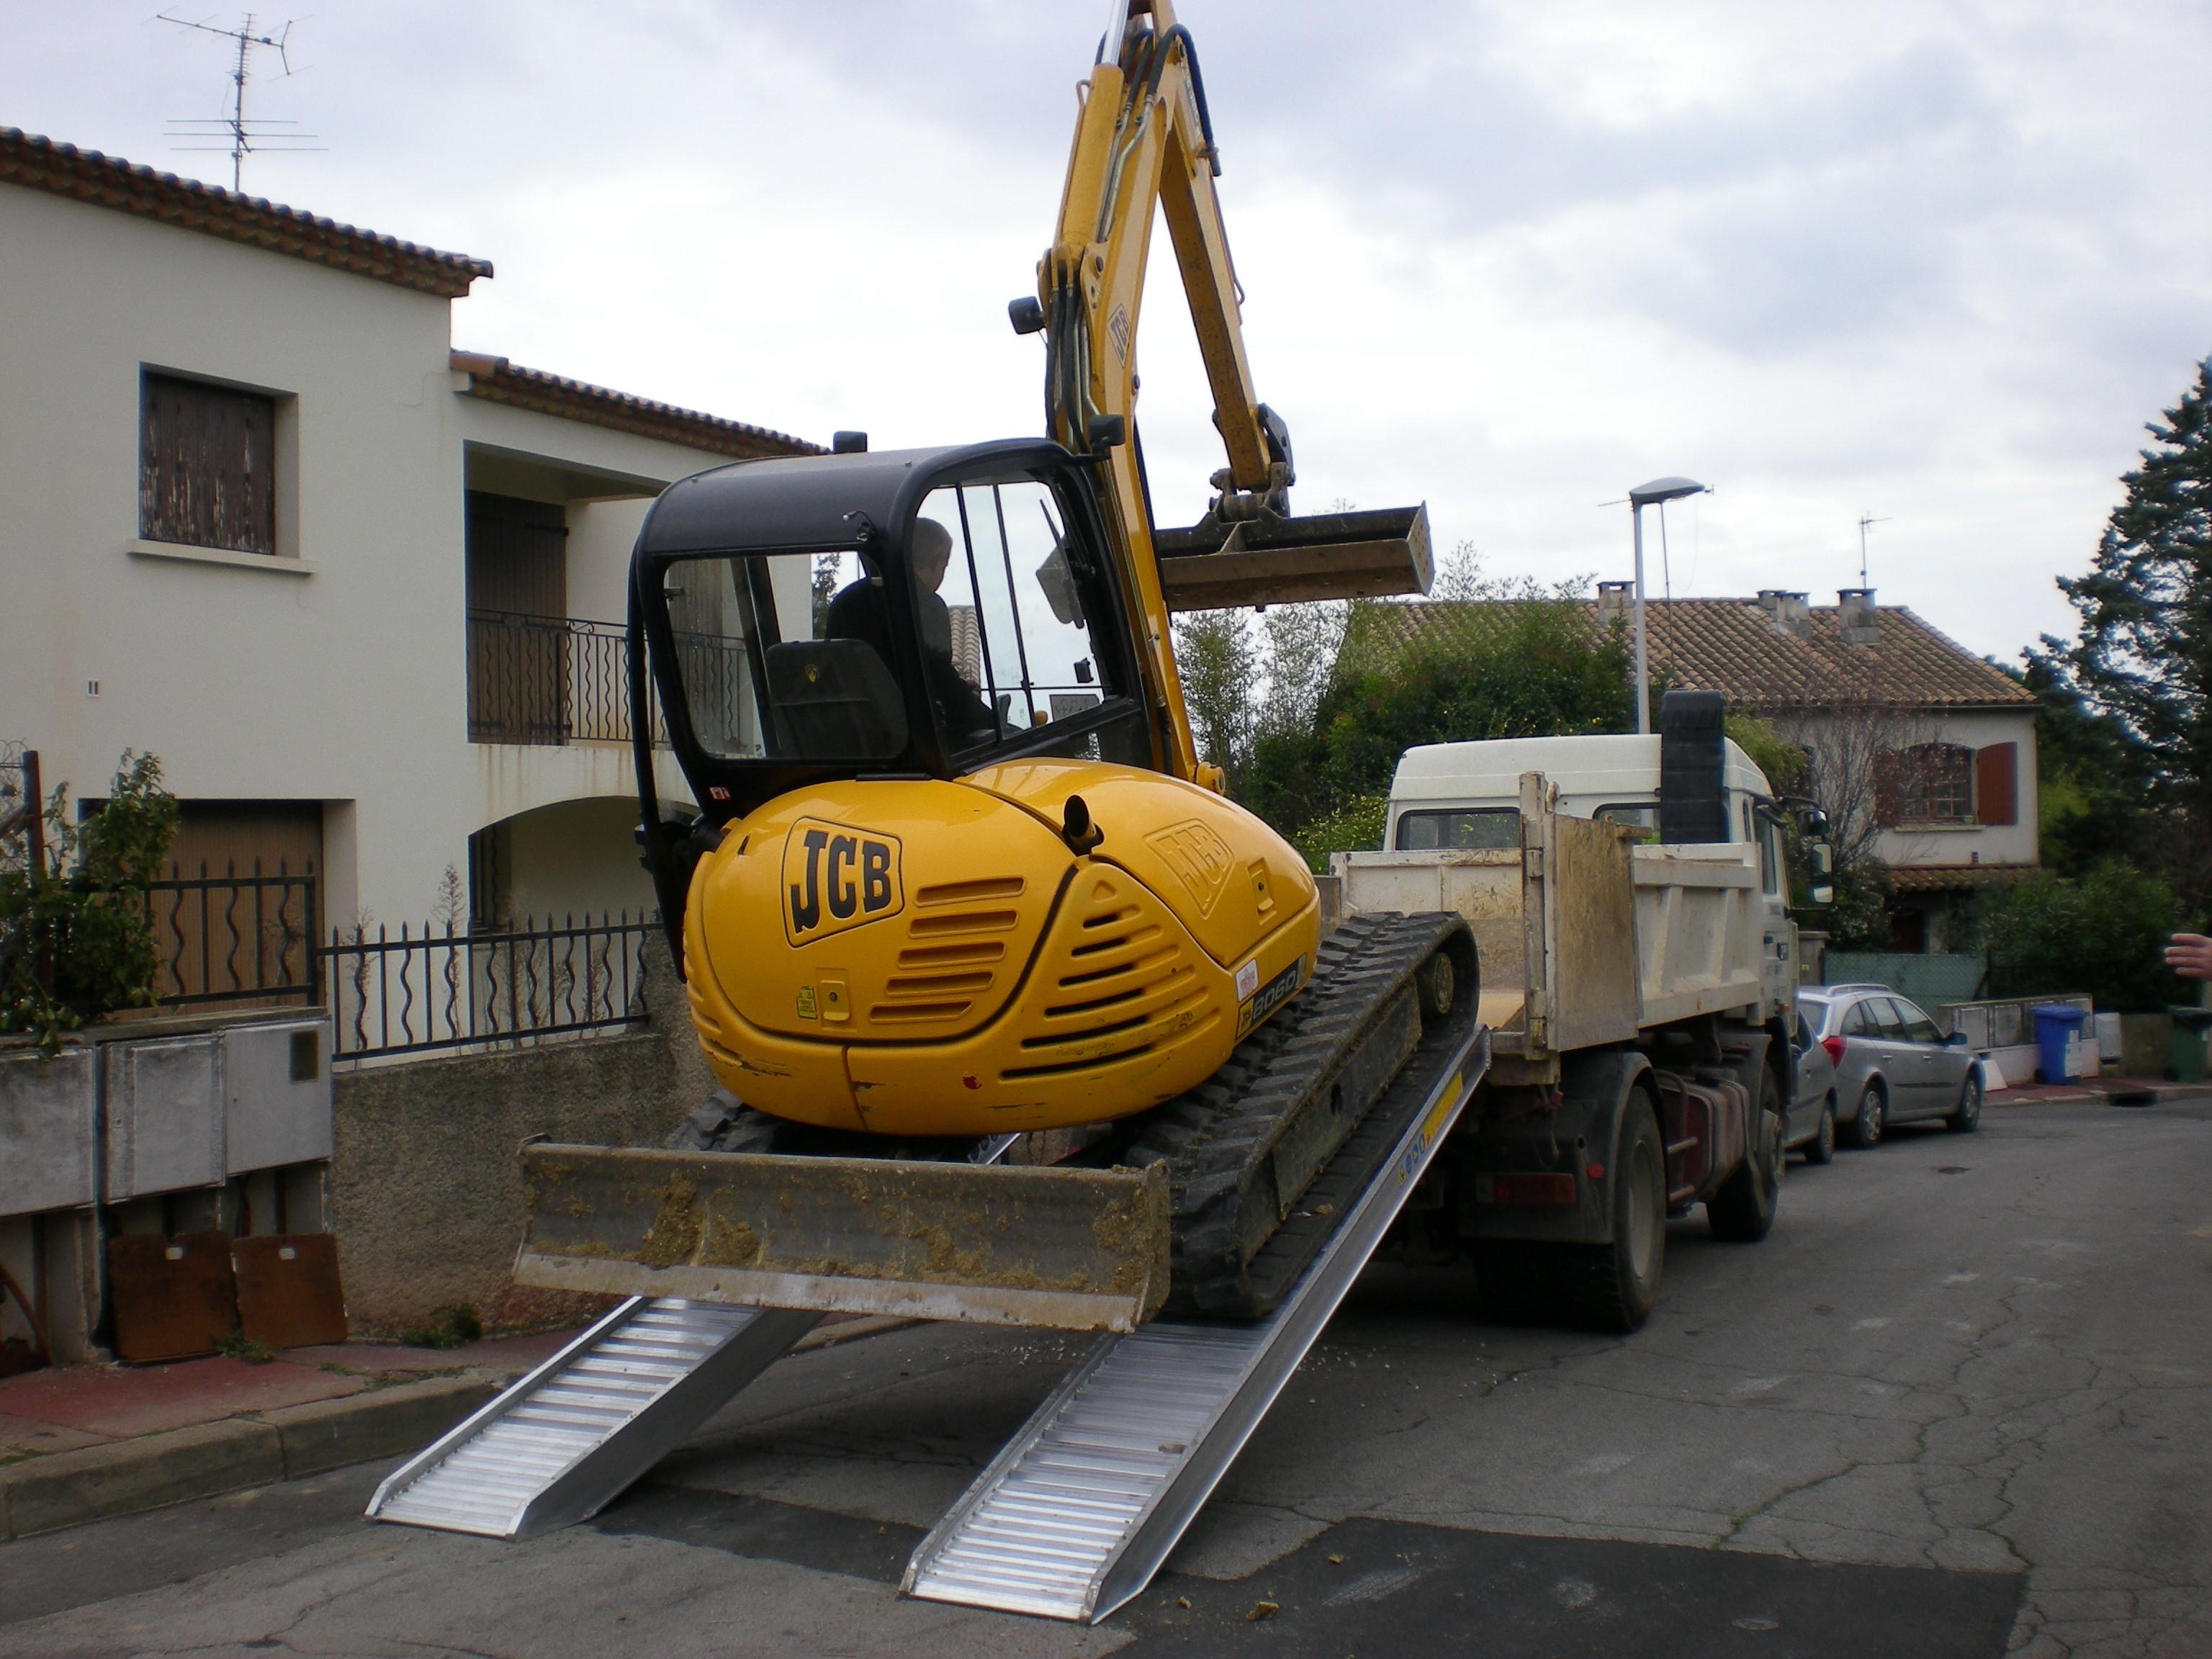 Plant & Vehicle Ramp 4500mm Long, 5300Kg Capacity, 500mm Wide